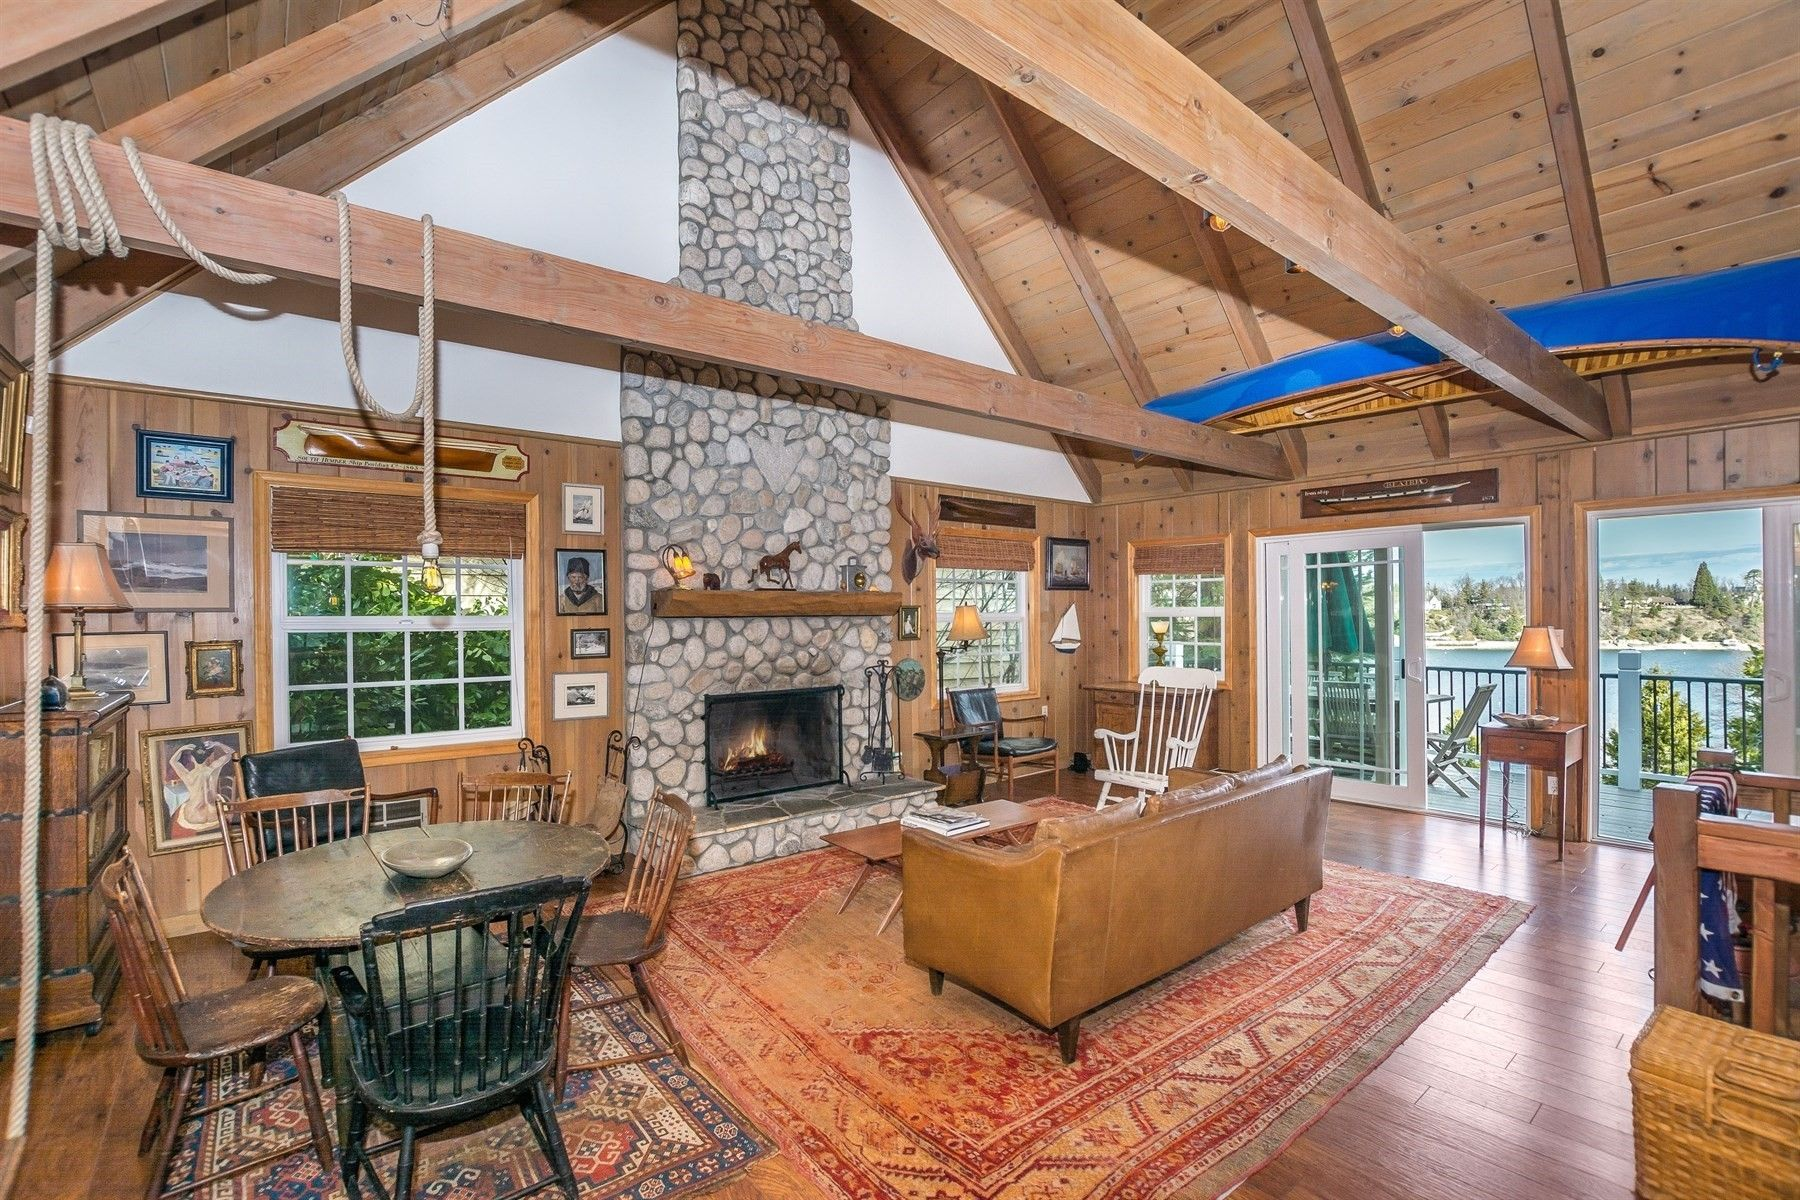 Lake Arrowhead Lakefront Cabin For Sale Lake Arrowhead Cabin Lake Arrowhead Cabins For Sale